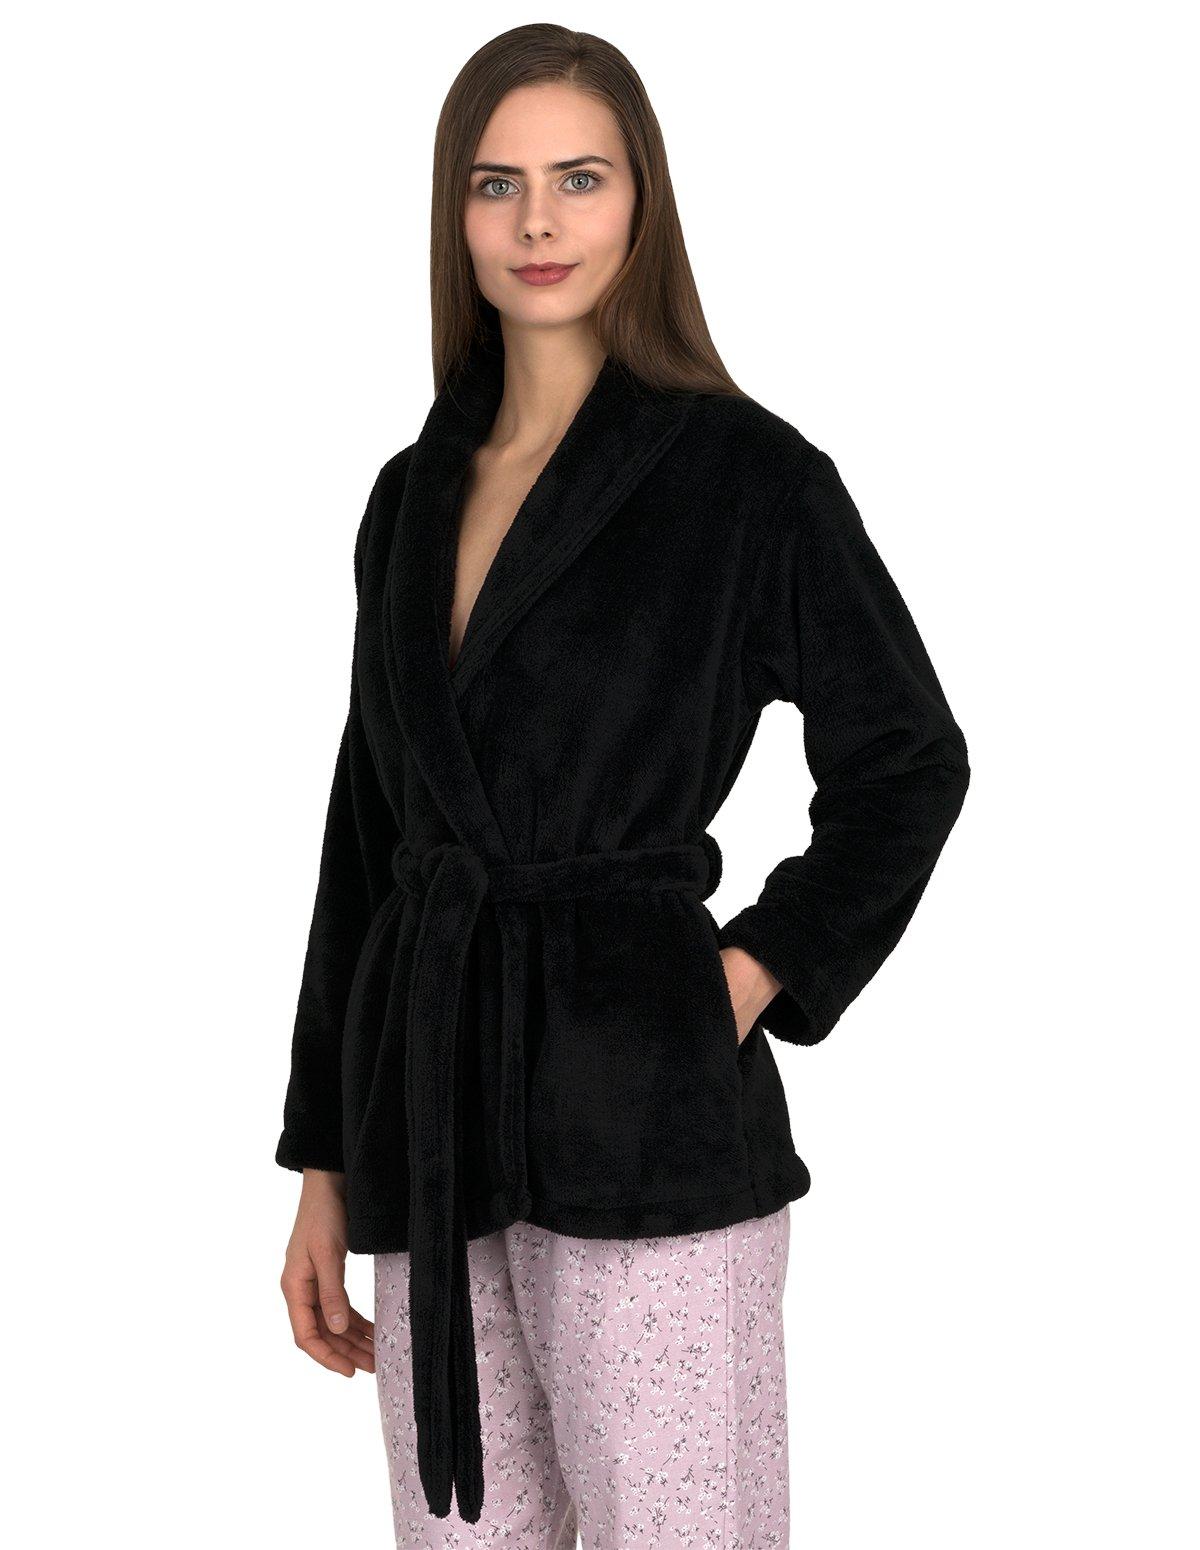 TowelSelections Women's Bed Jacket Fleece Cardigan Cuddly Robe